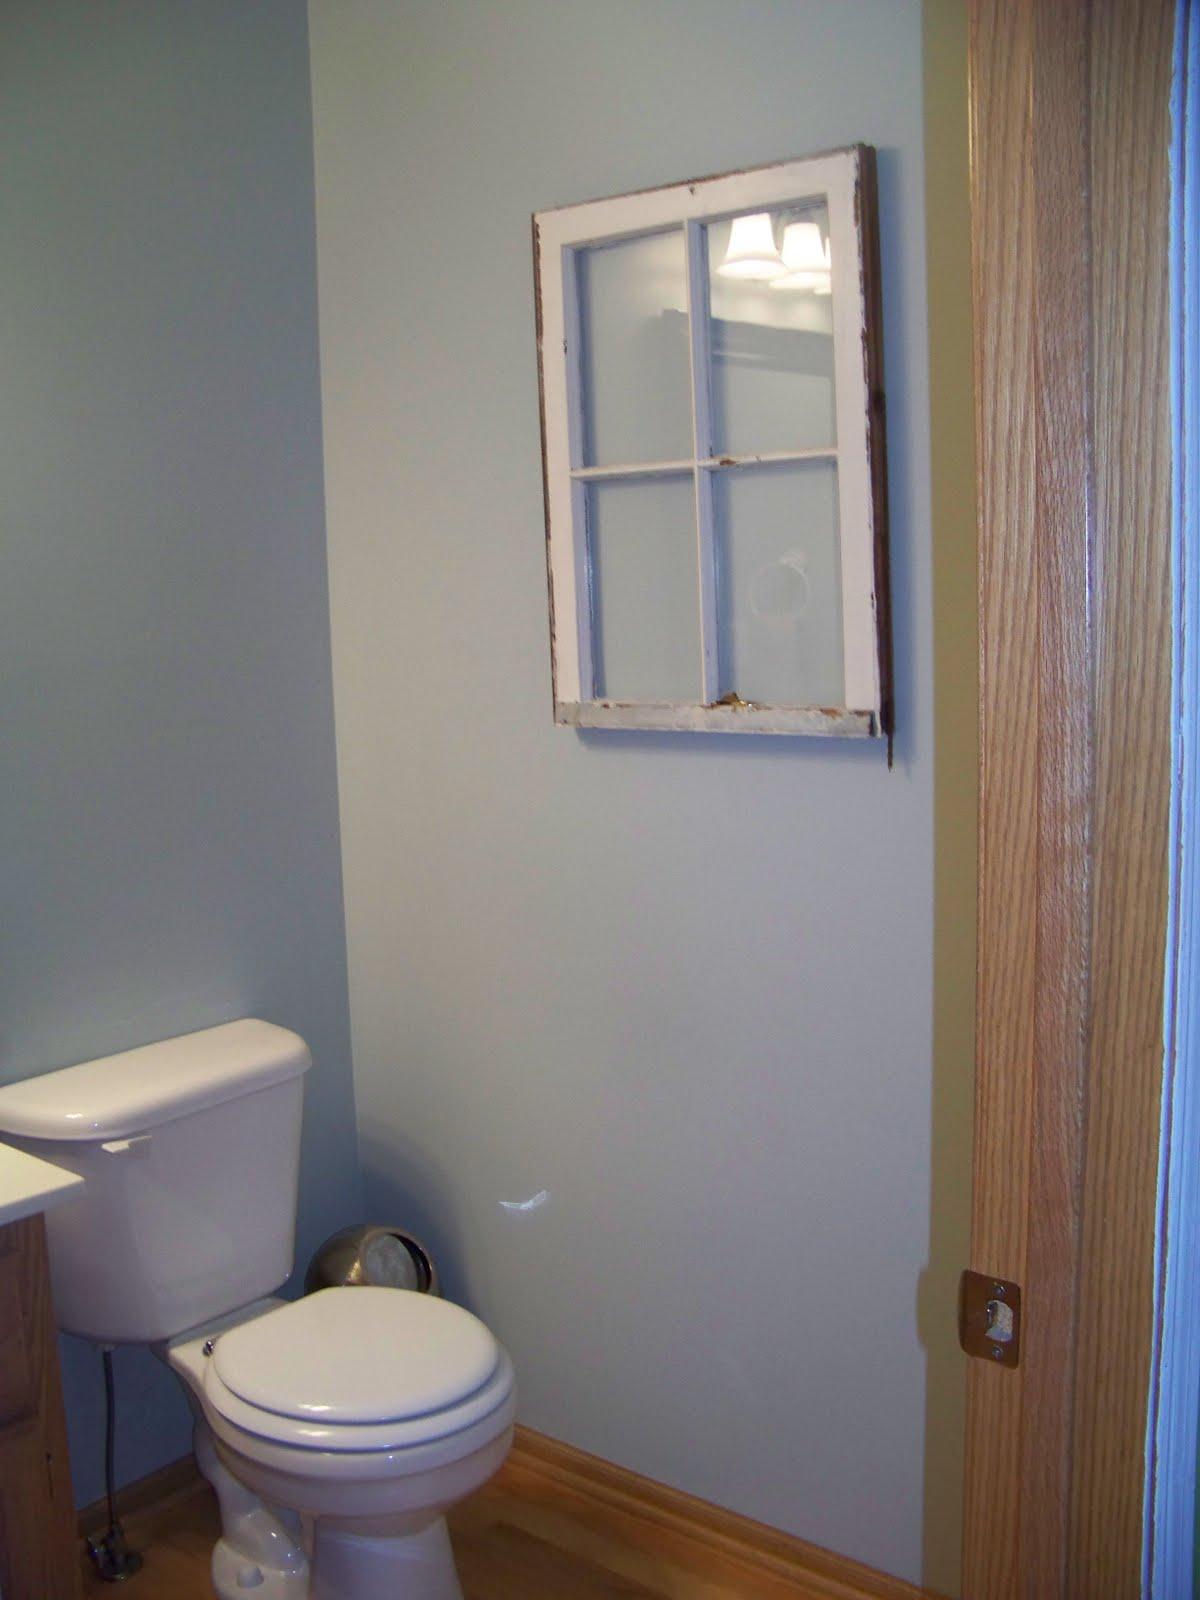 Powder room gone wild for Wild bathrooms